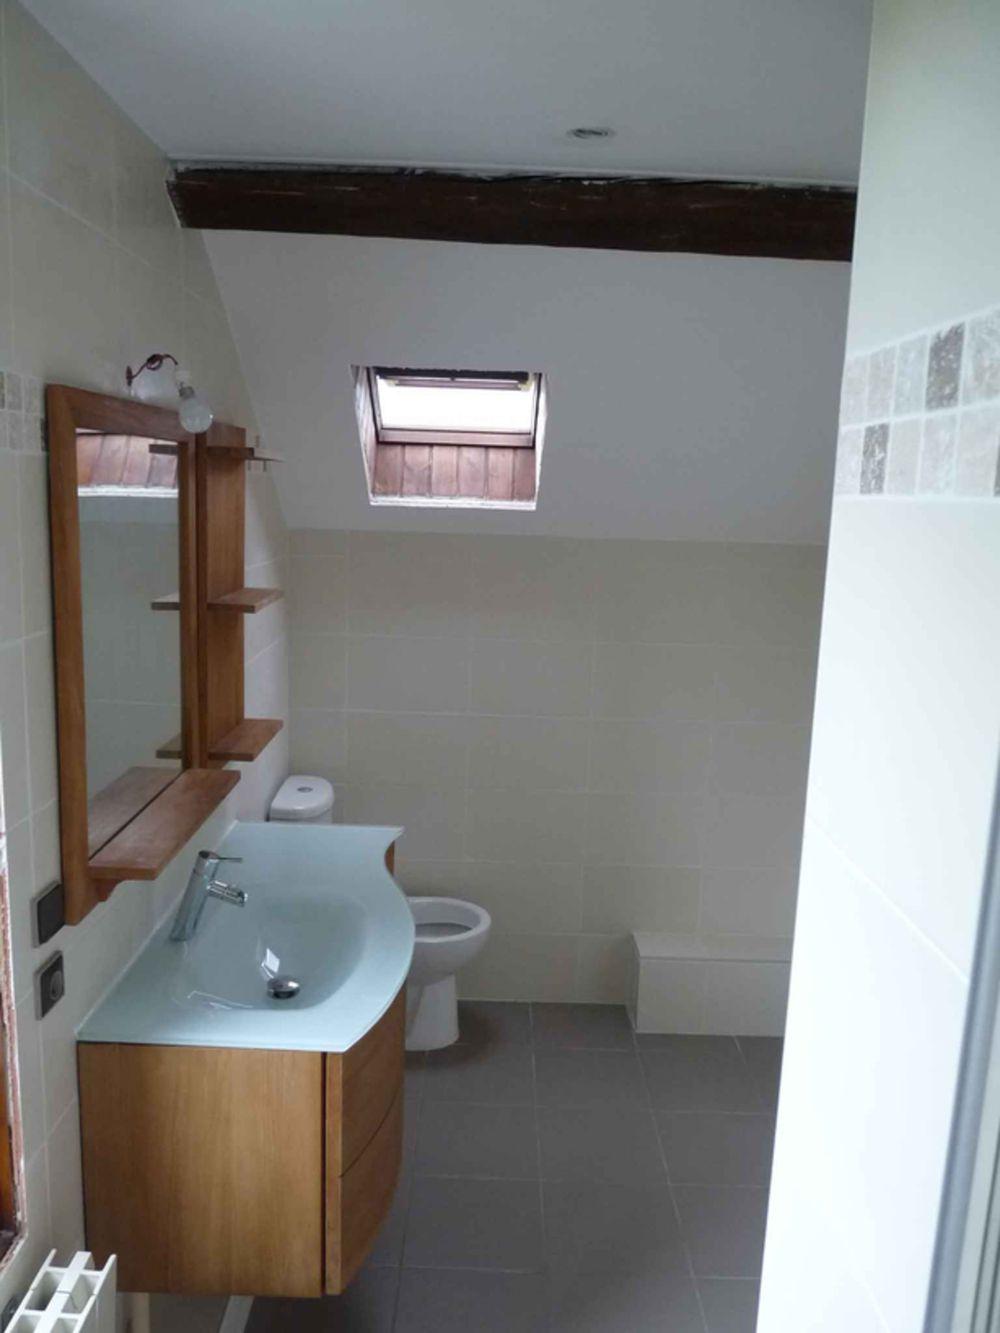 Salle De Bain De Luxe Design ~ r novation d une salle de bain moirans a demeure services